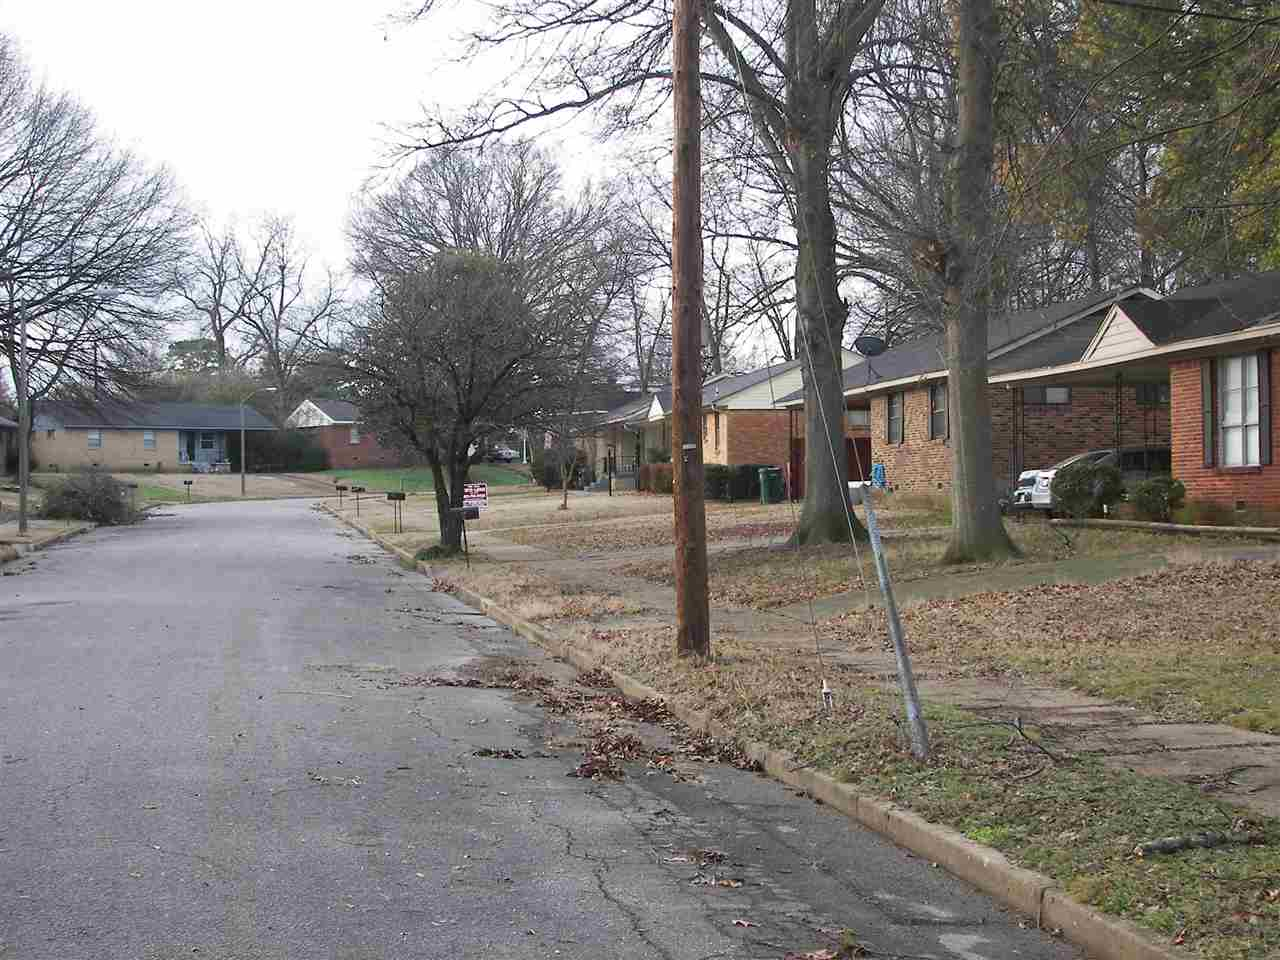 3160 Dahlia Memphis, TN 38127 - MLS #: 10027066